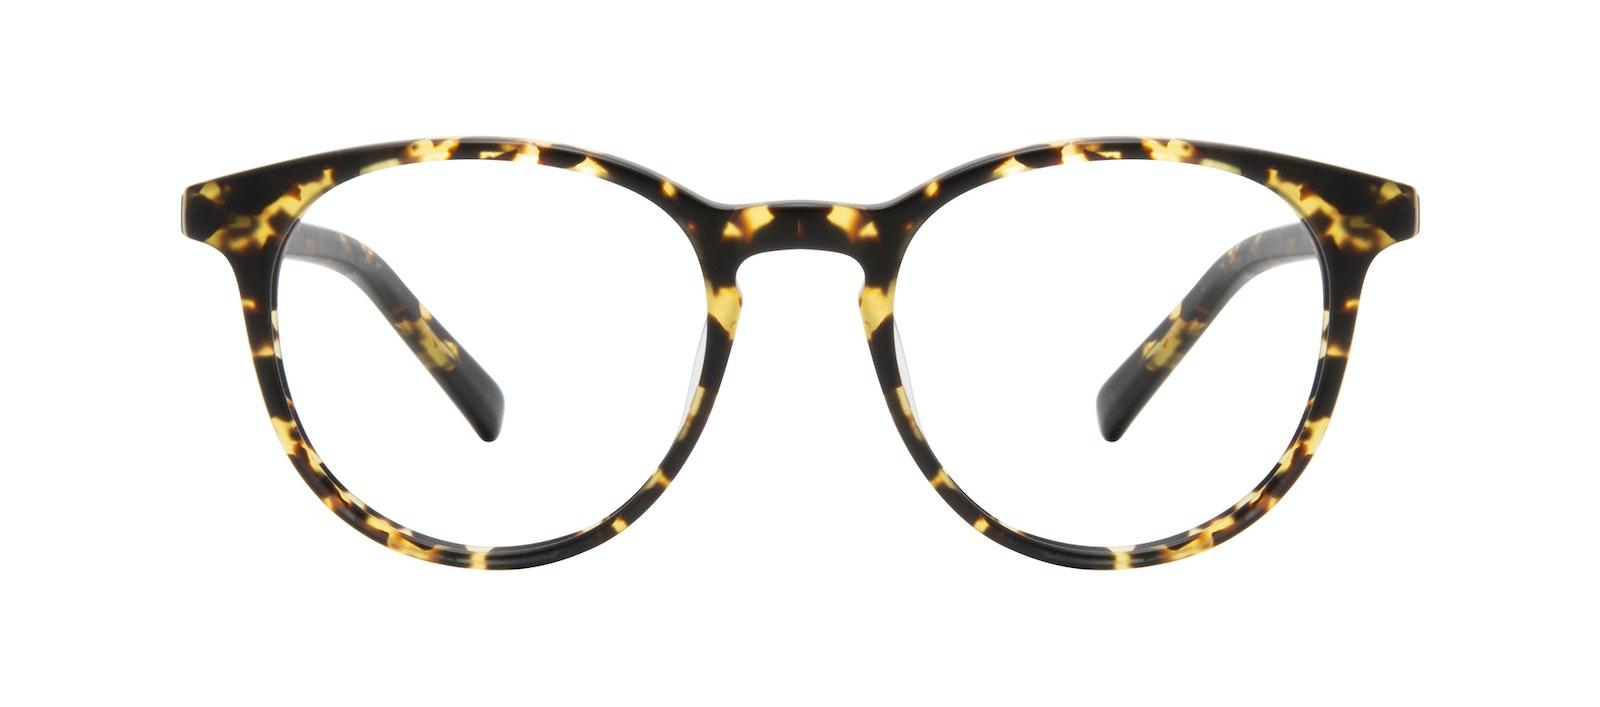 Affordable Fashion Glasses Round Eyeglasses Men Select Tortoise Matte Front